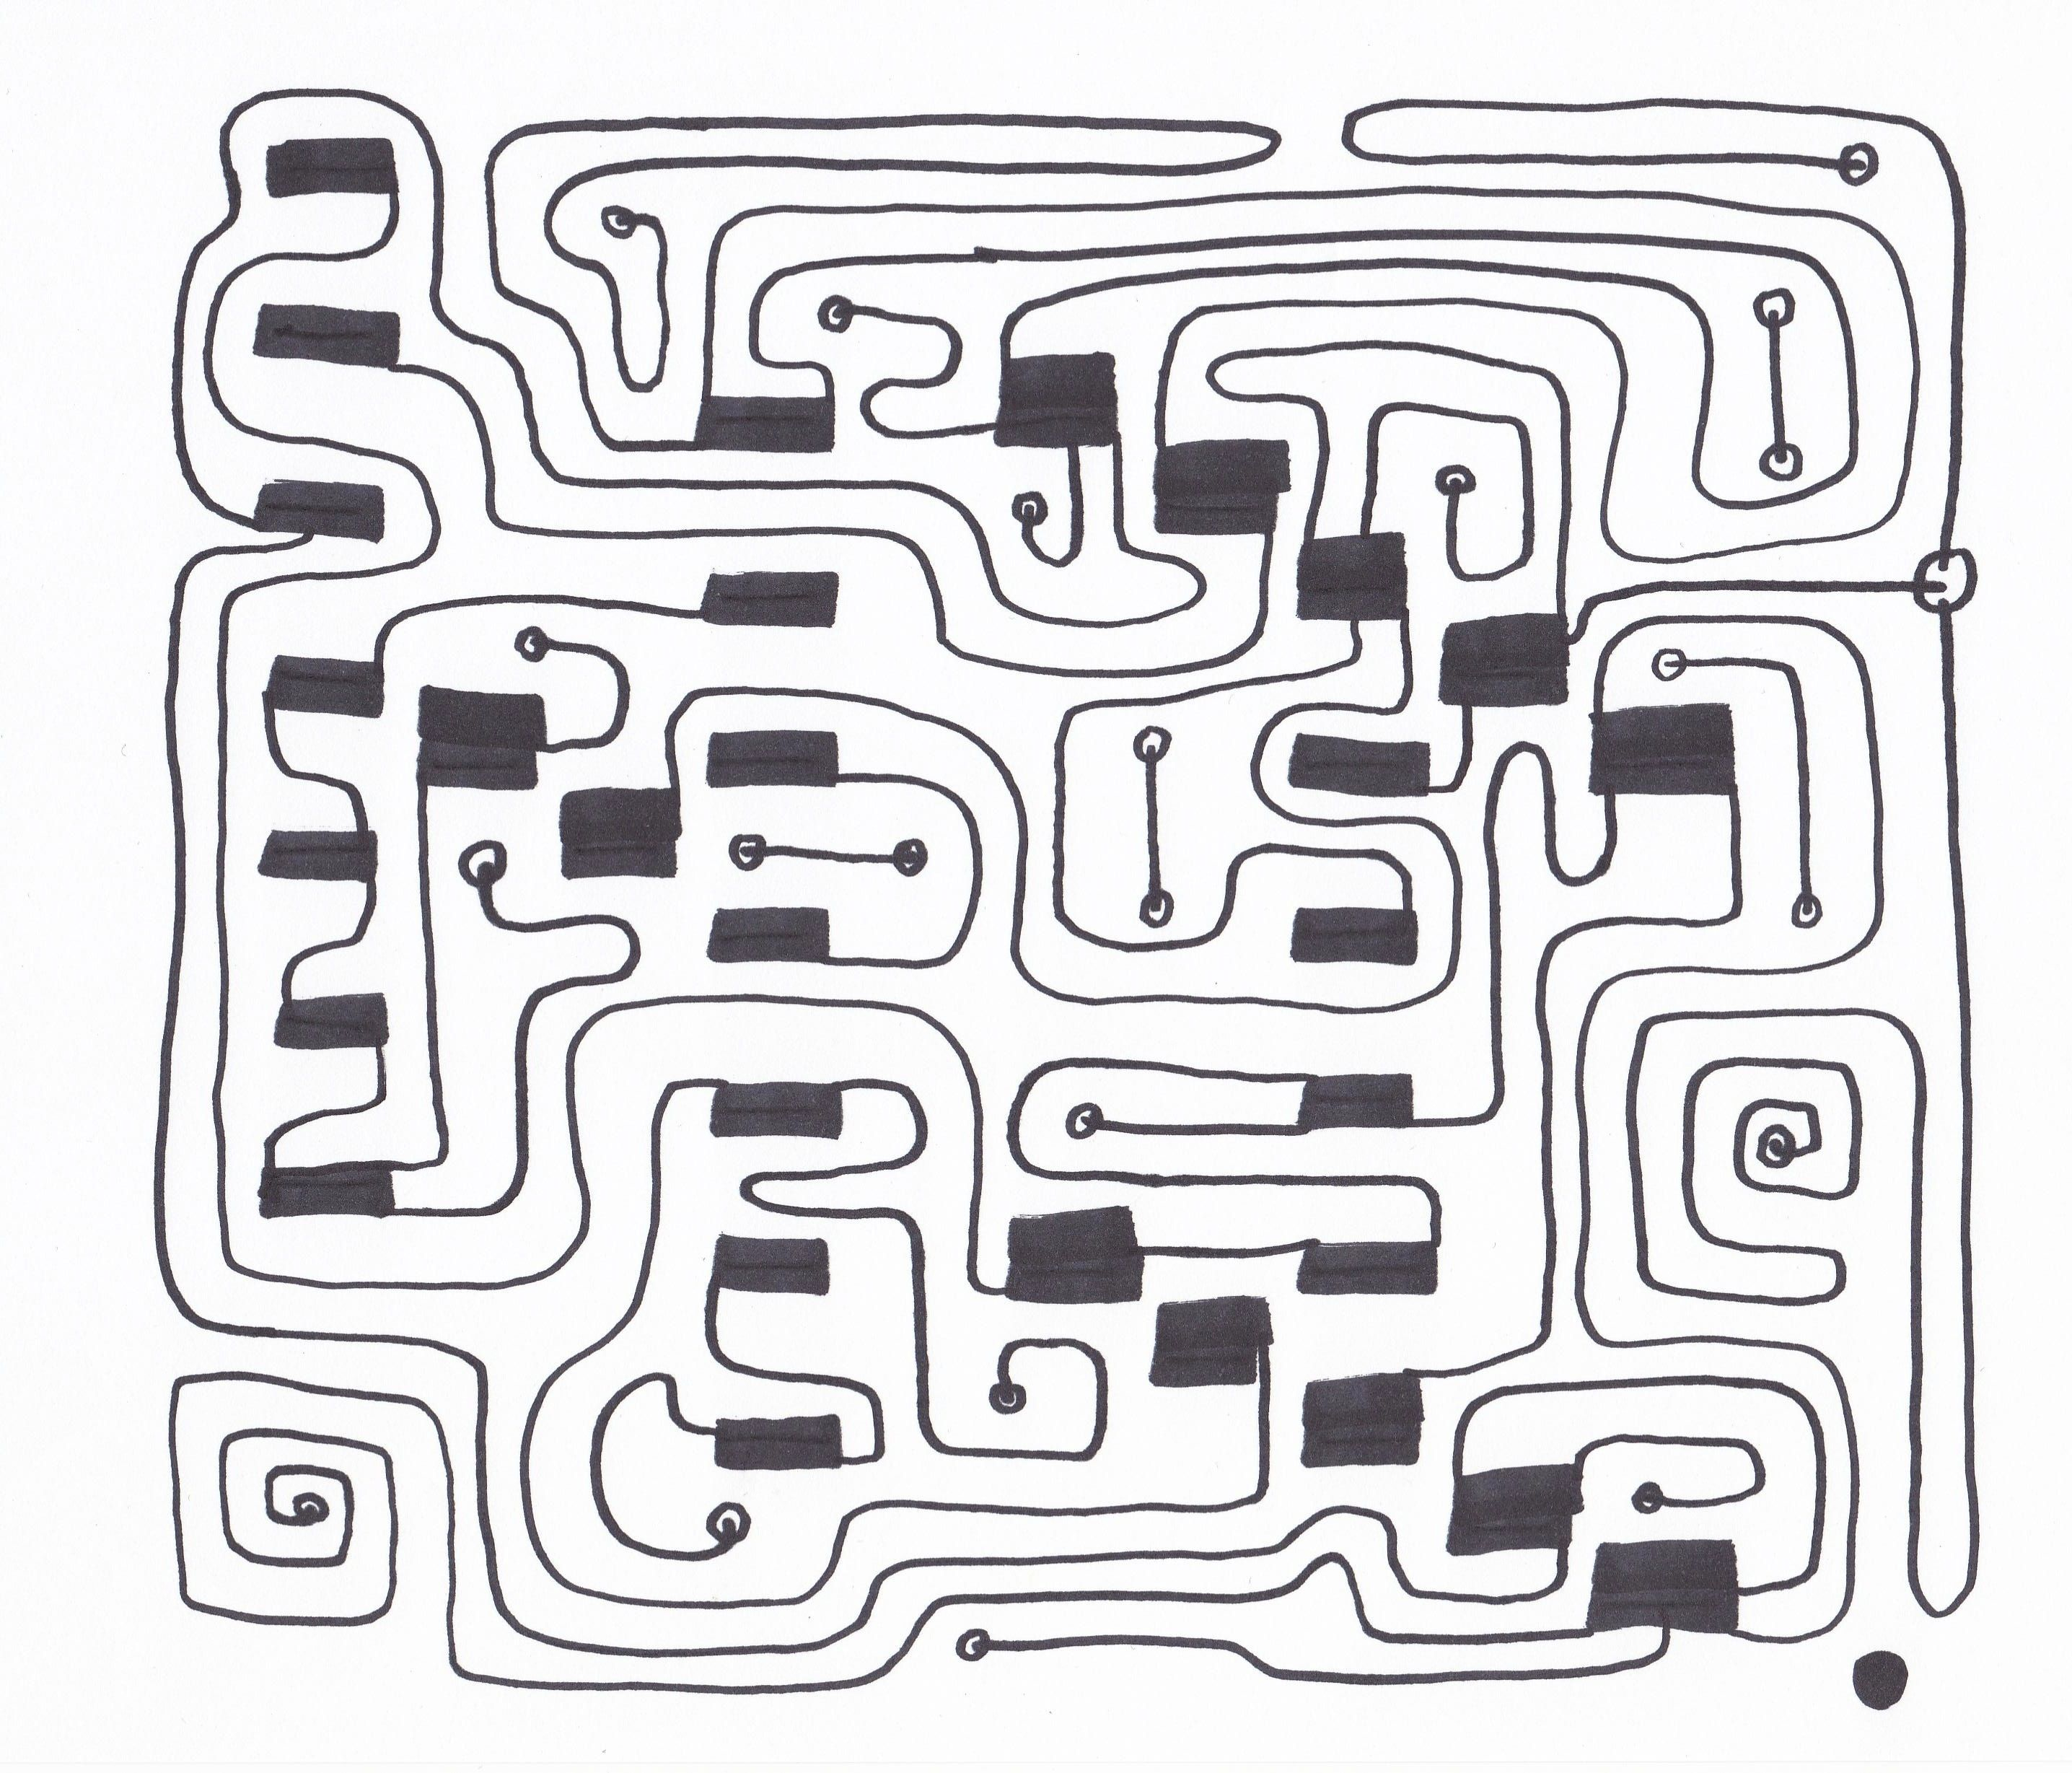 simple circuit game